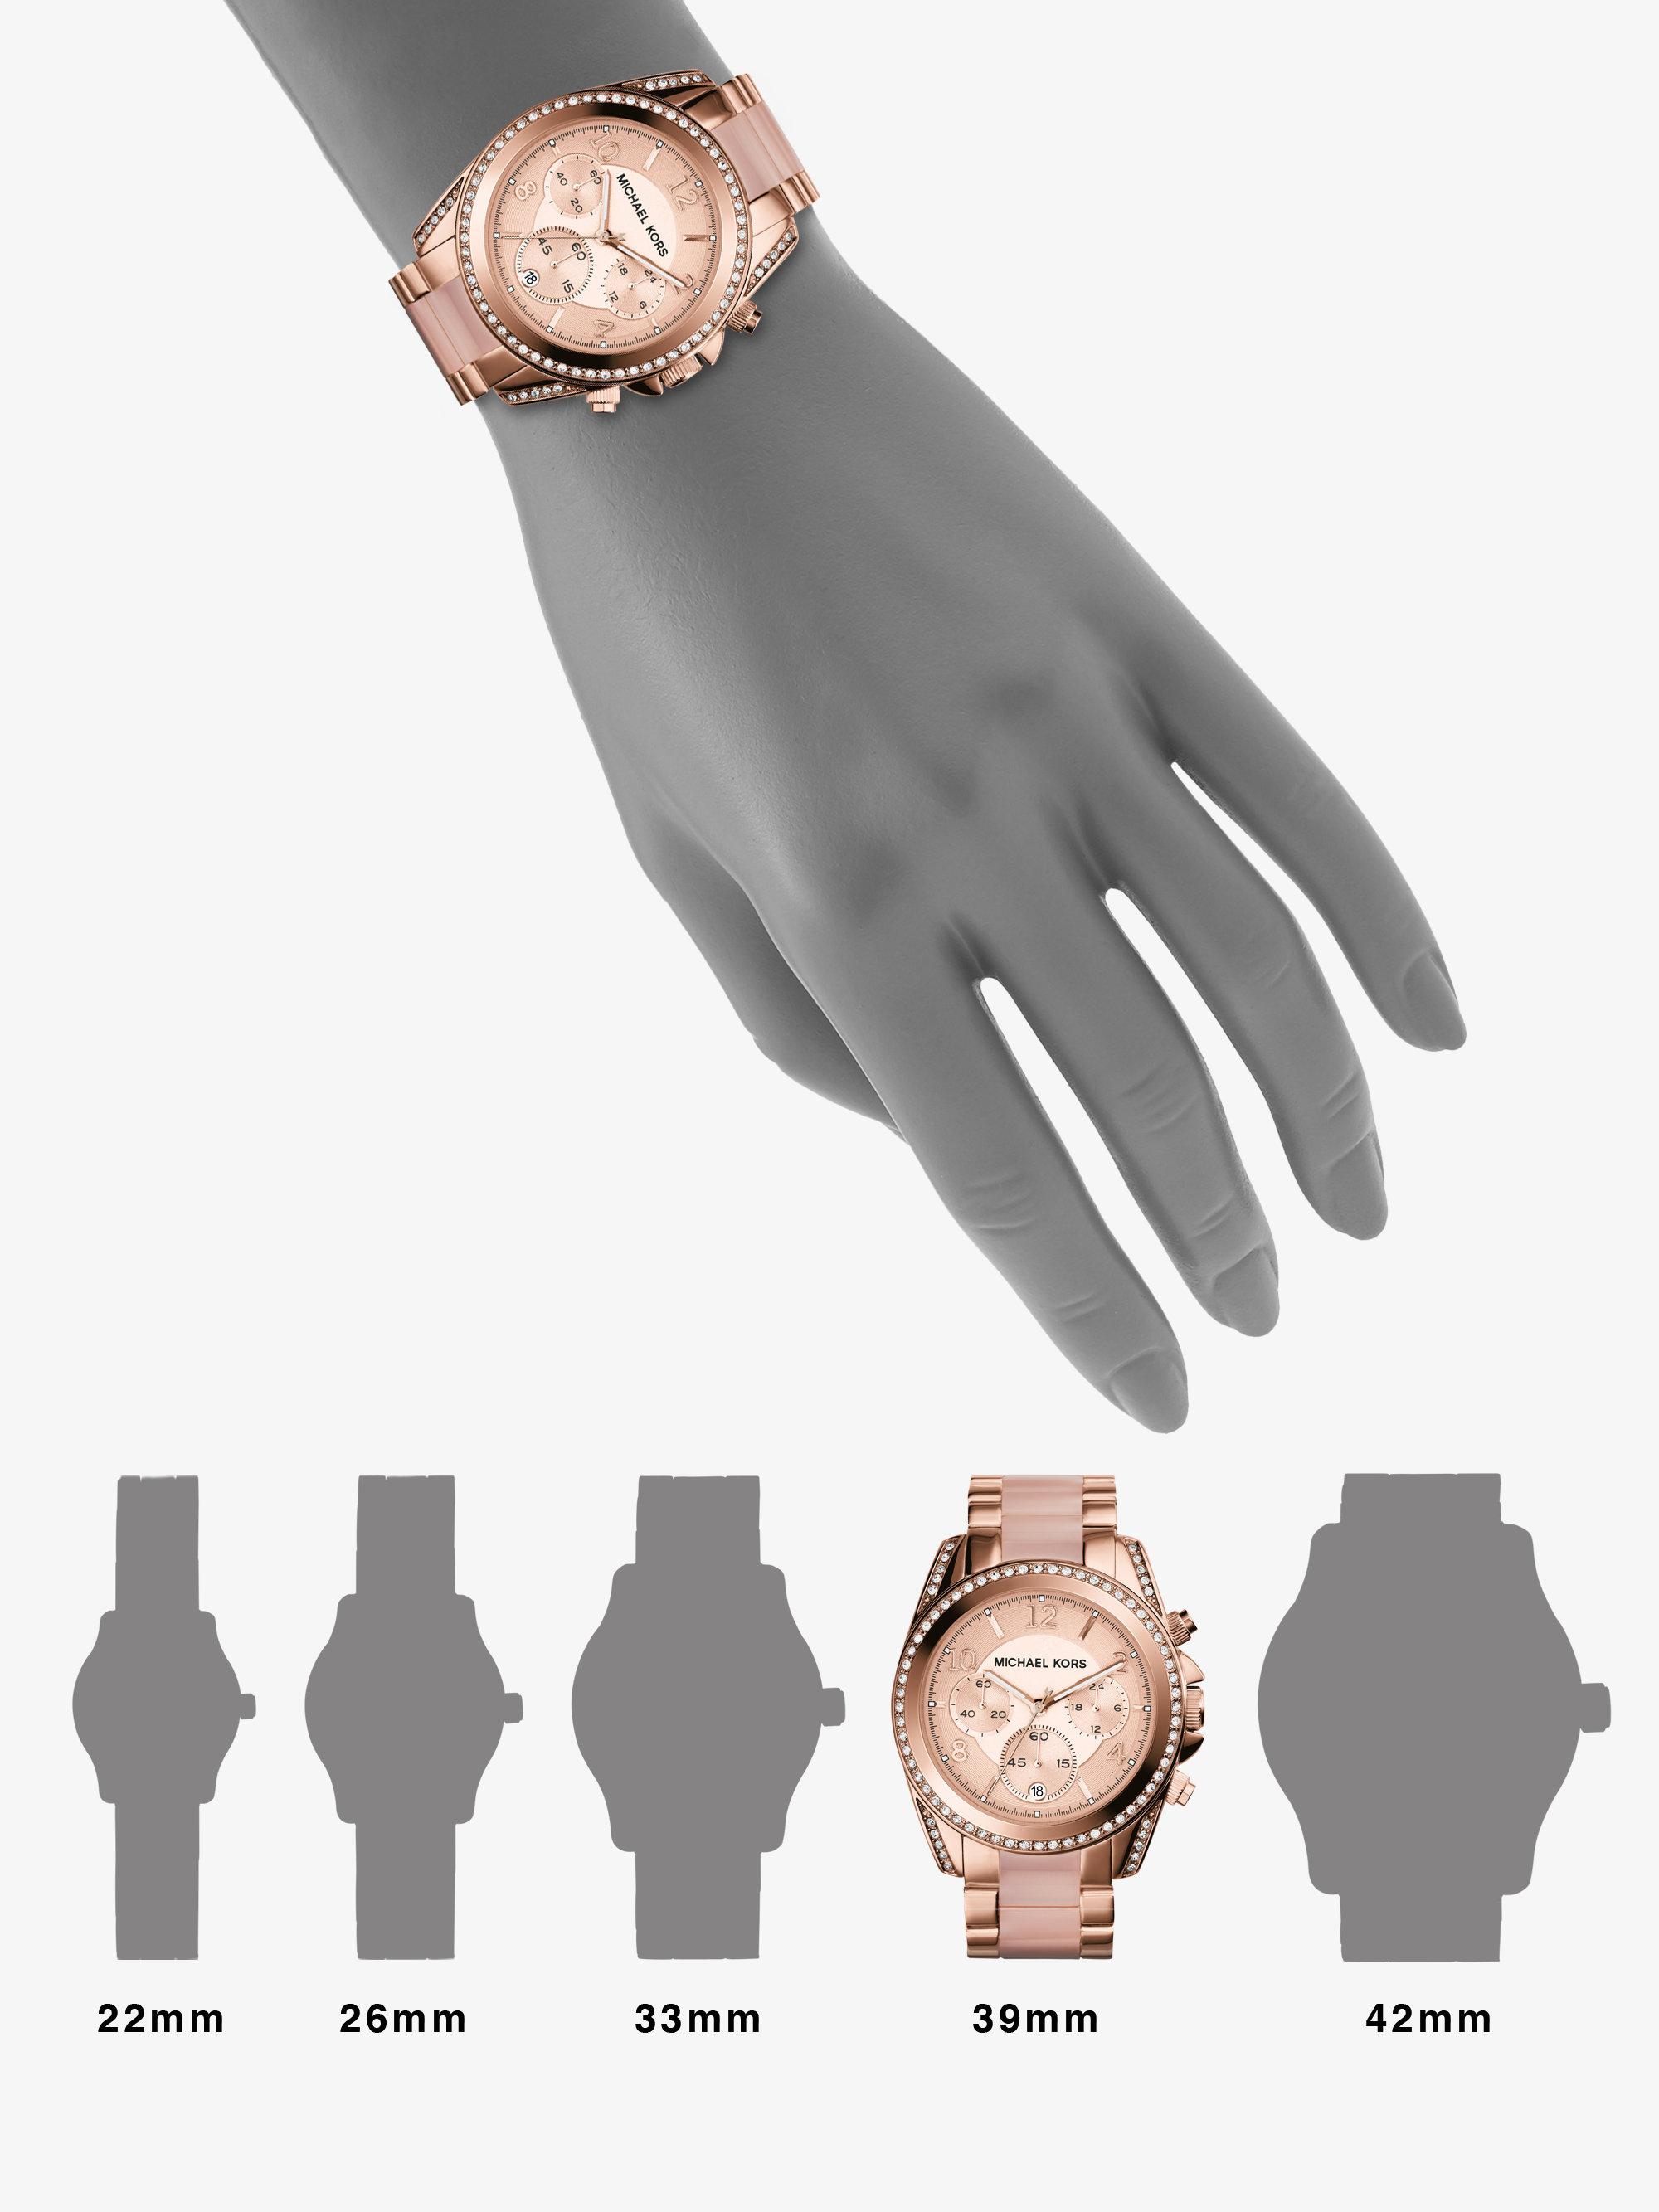 120972a3058b Michael Kors Blair Rose Gold-Tone Chronograph Watch - HD Image ...